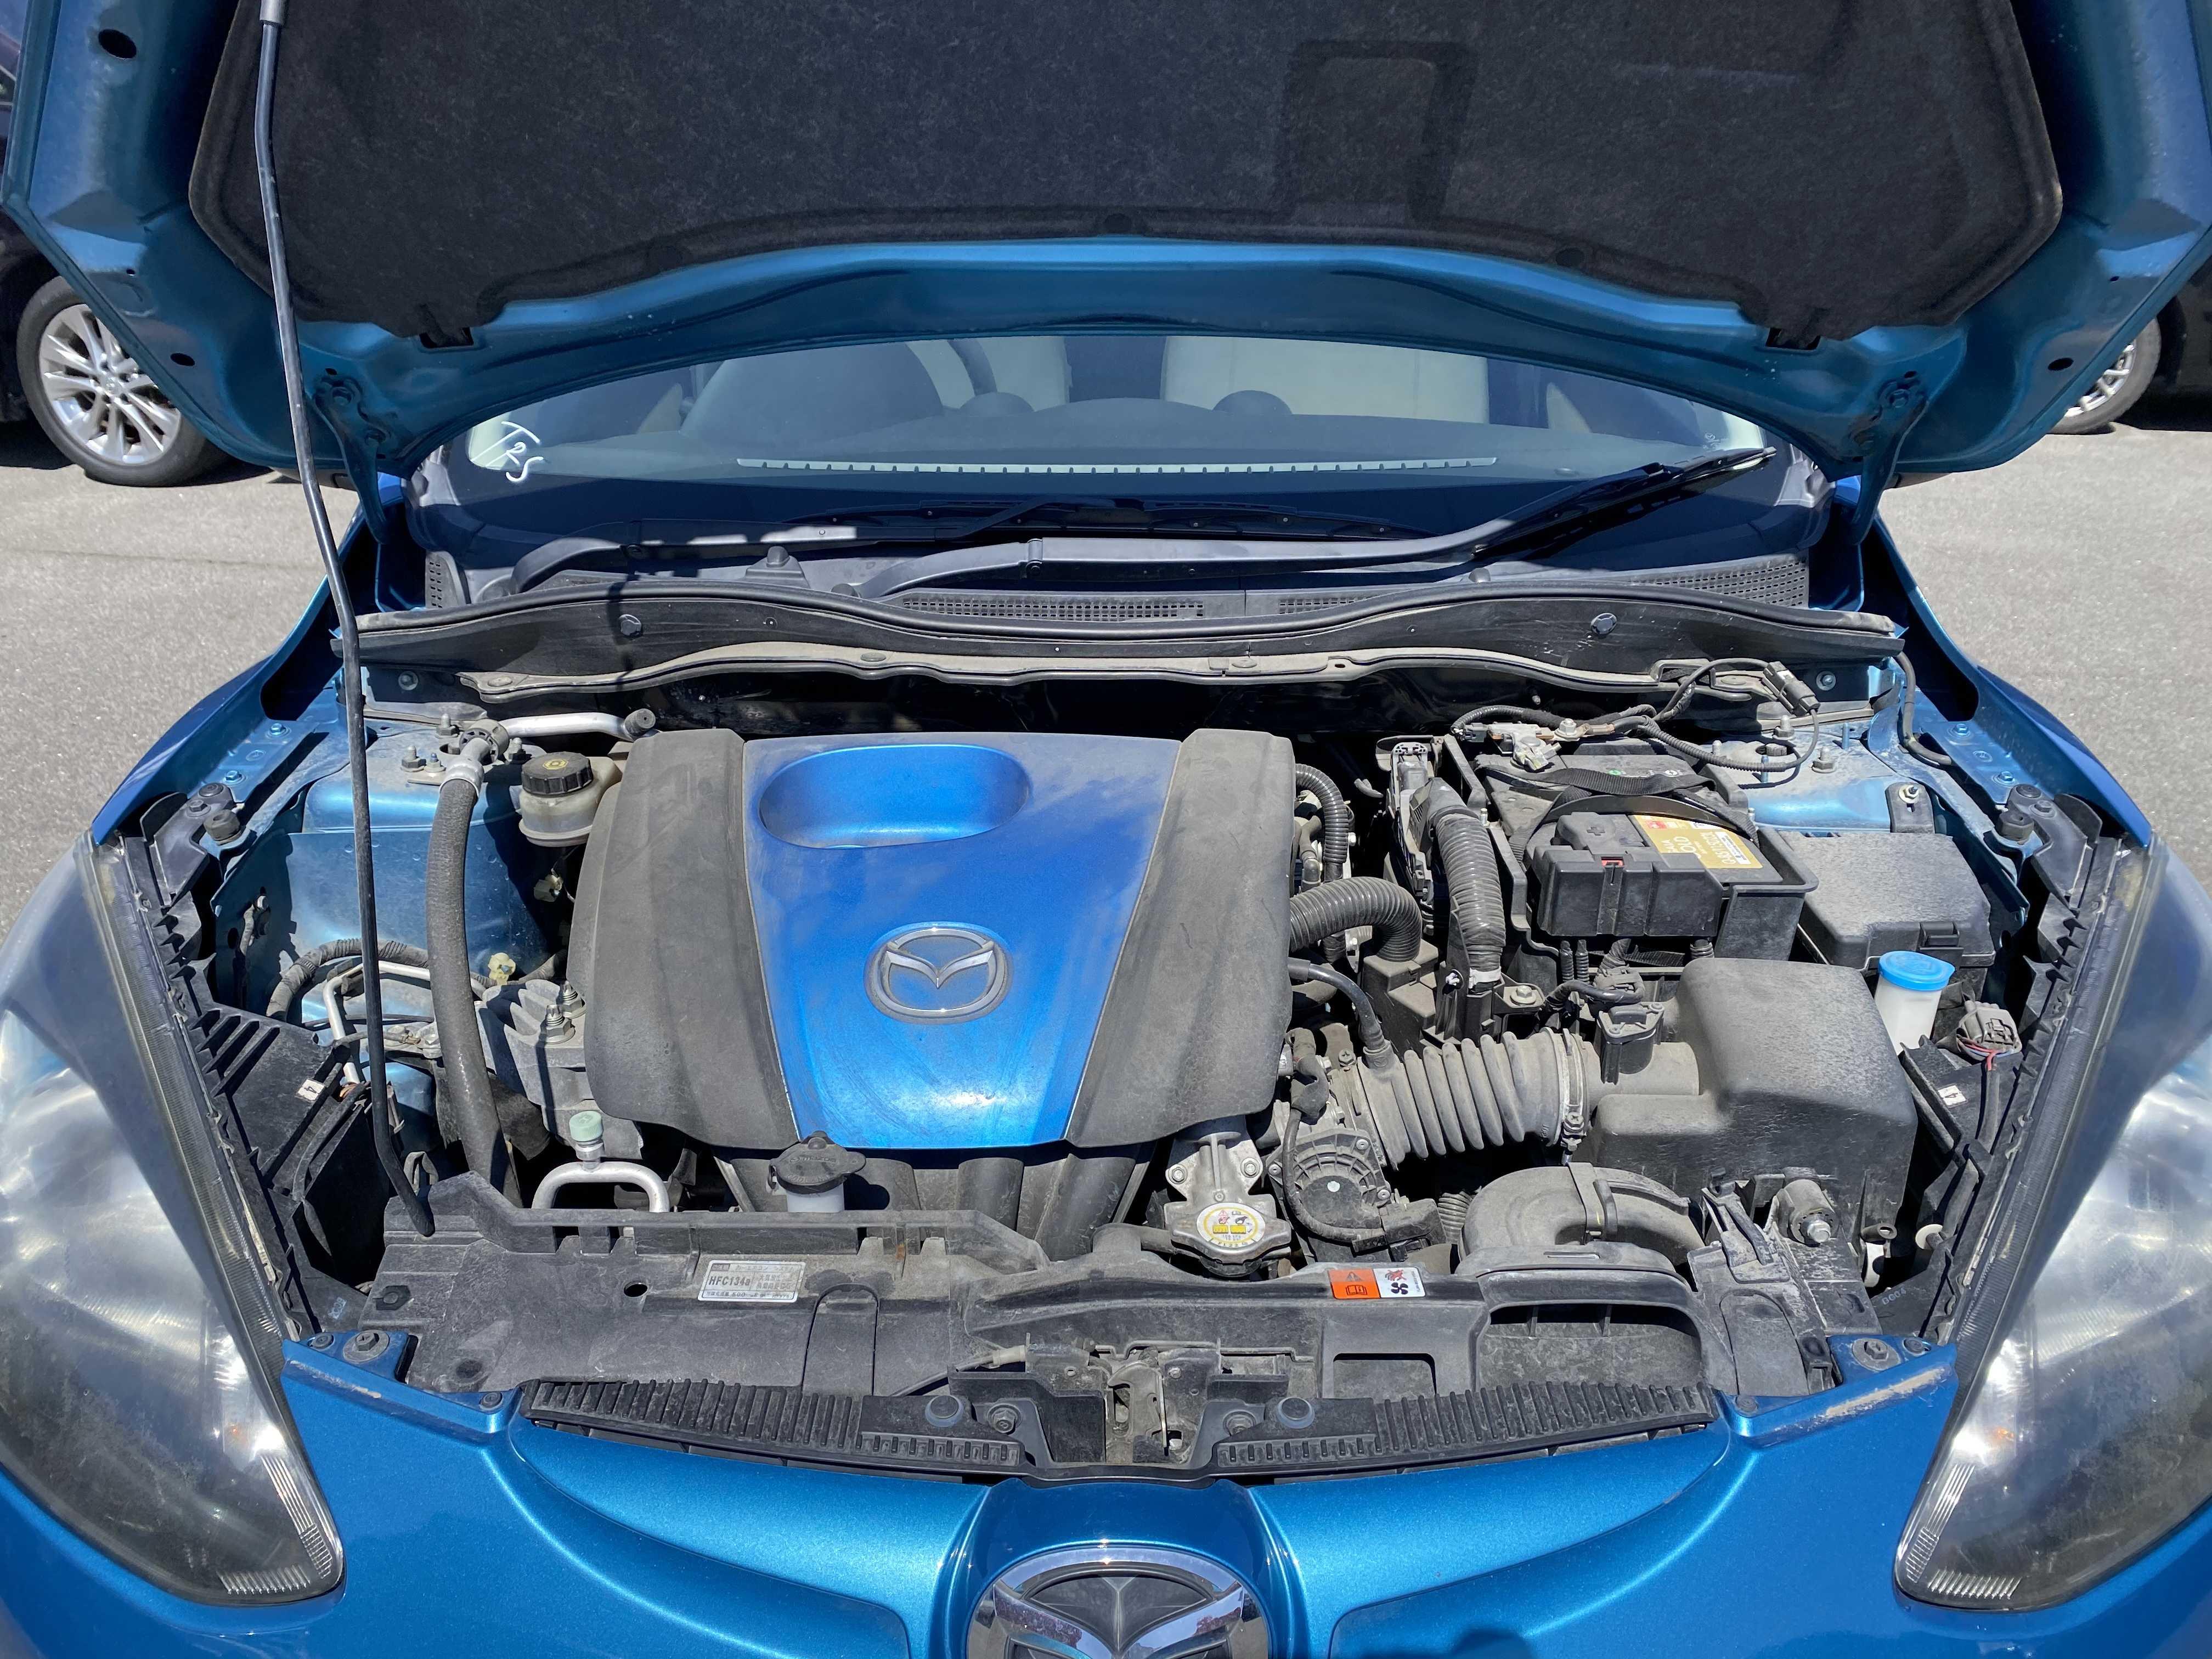 Mazda Demio 2012, BLUE, 1290cc, ATM - Autocraft Japan